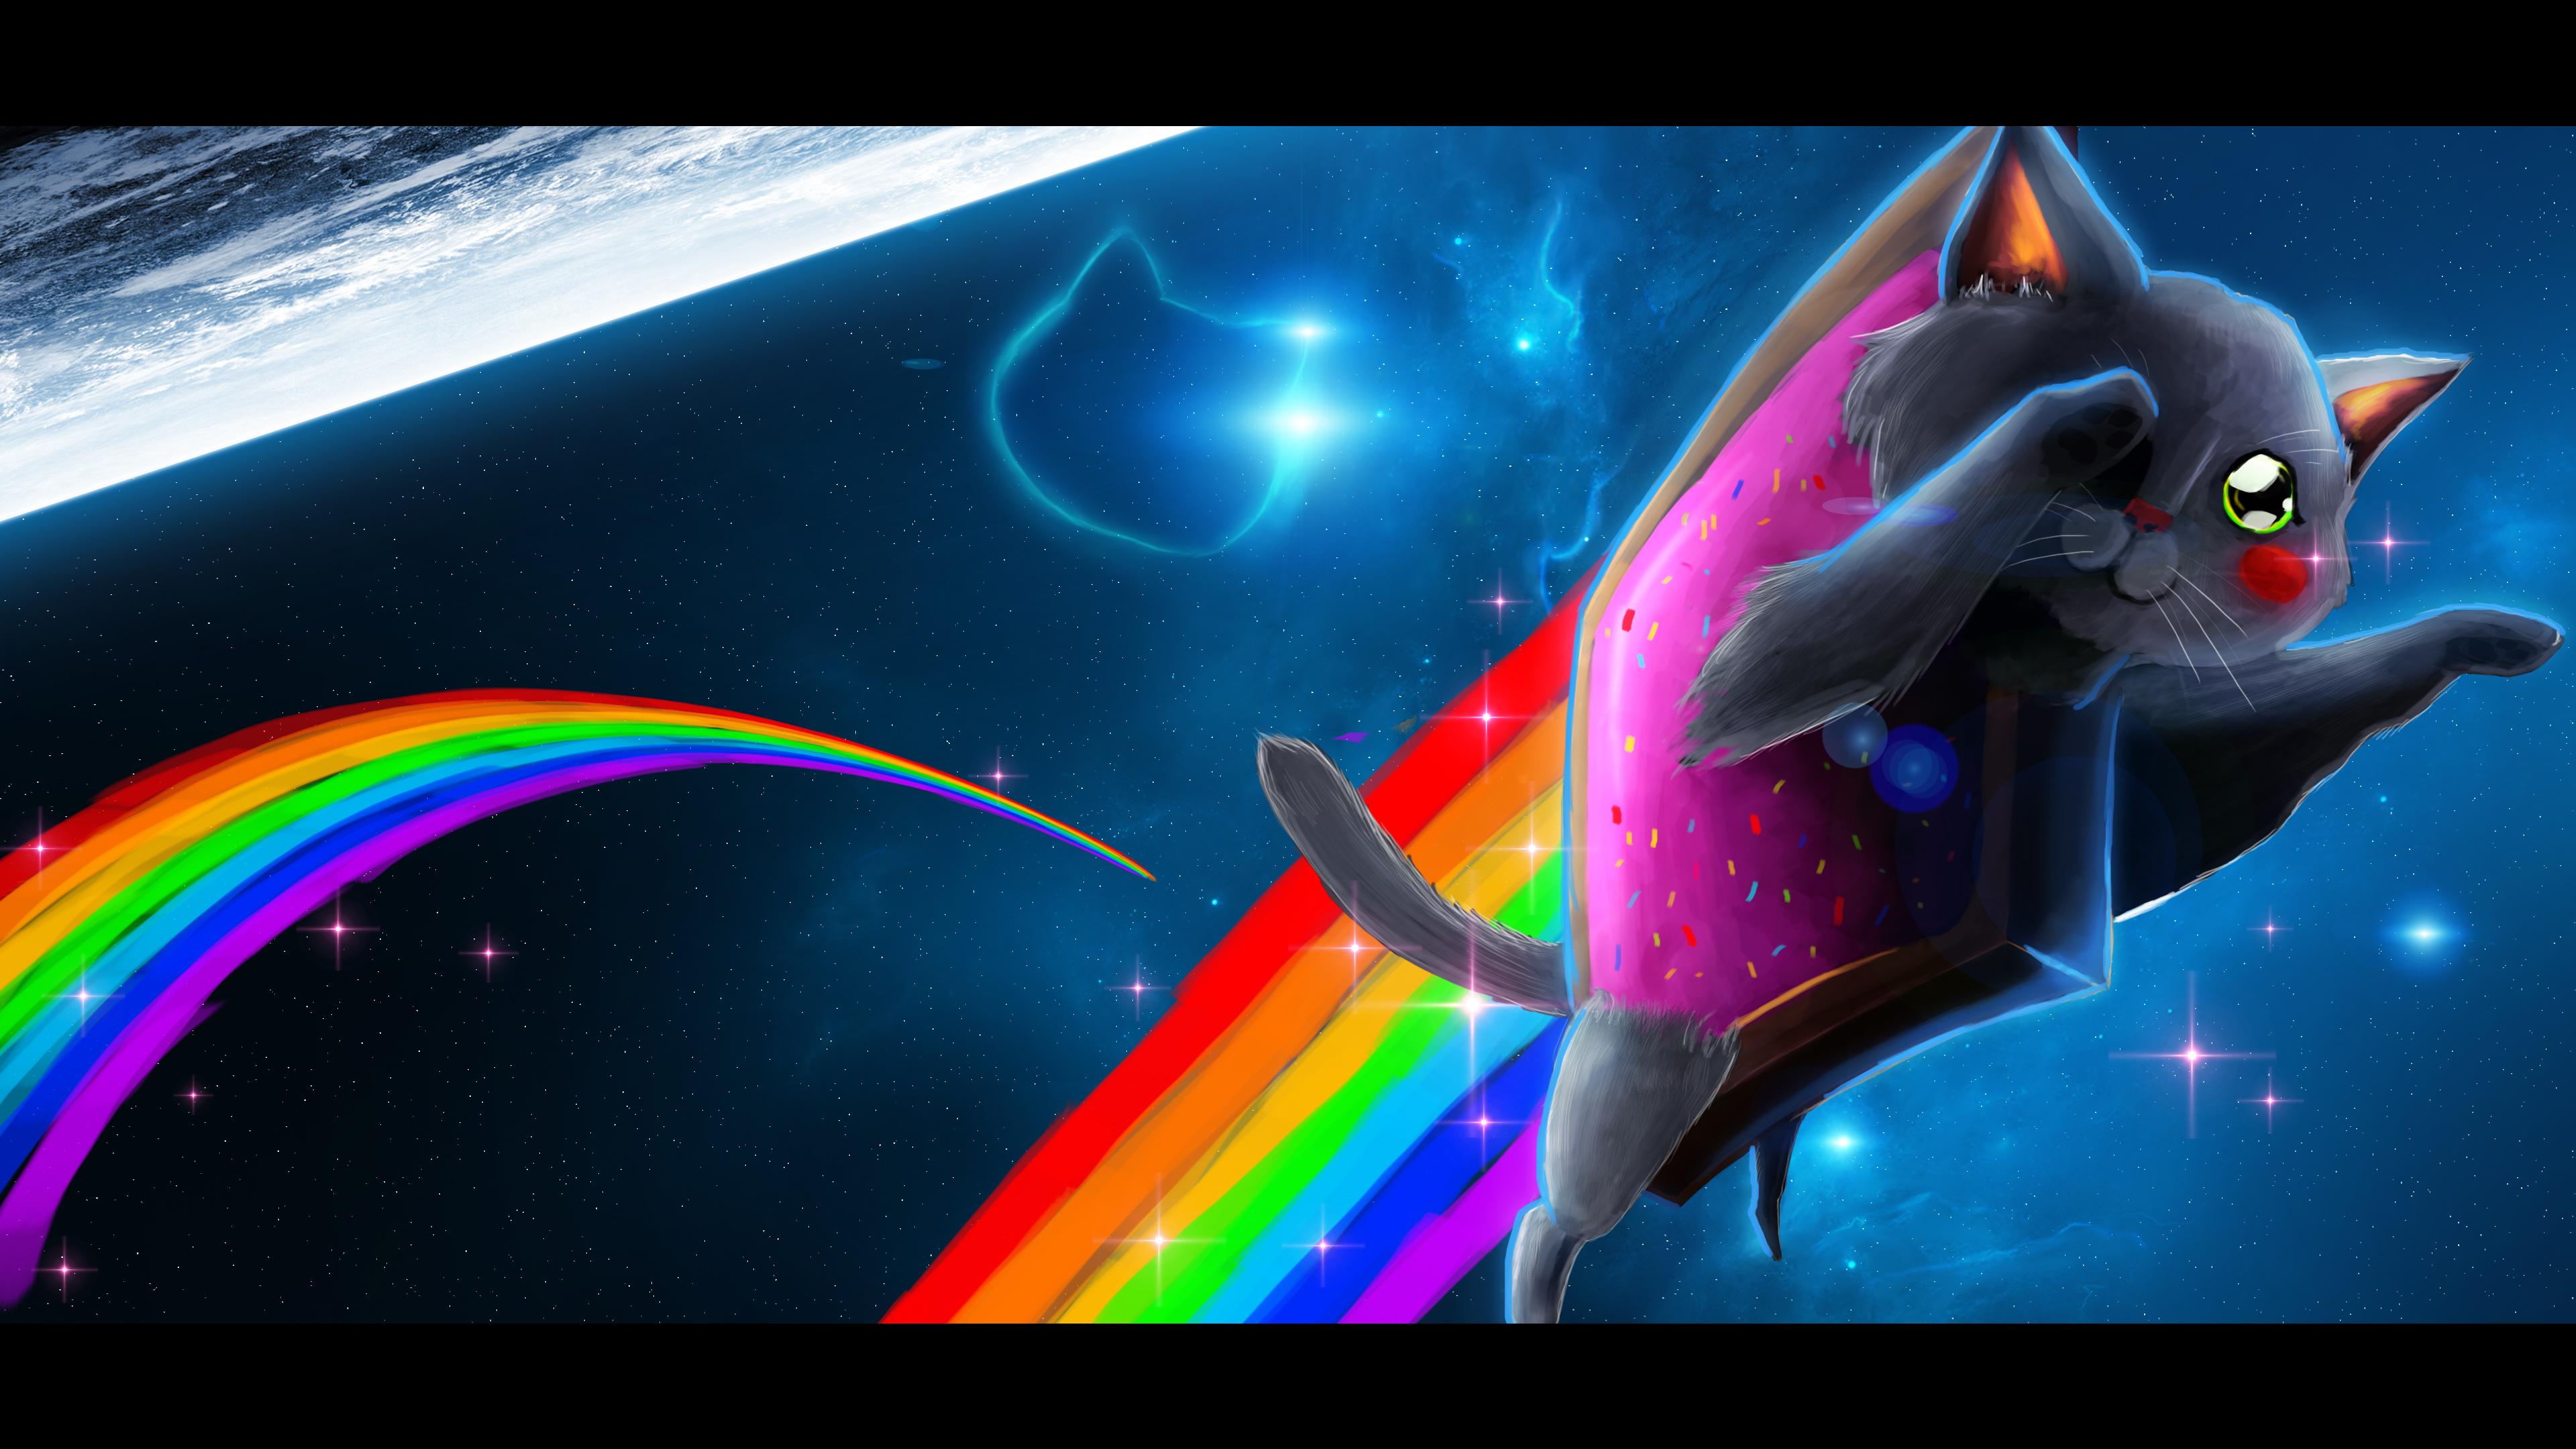 rainbow cat wallpapers - photo #40